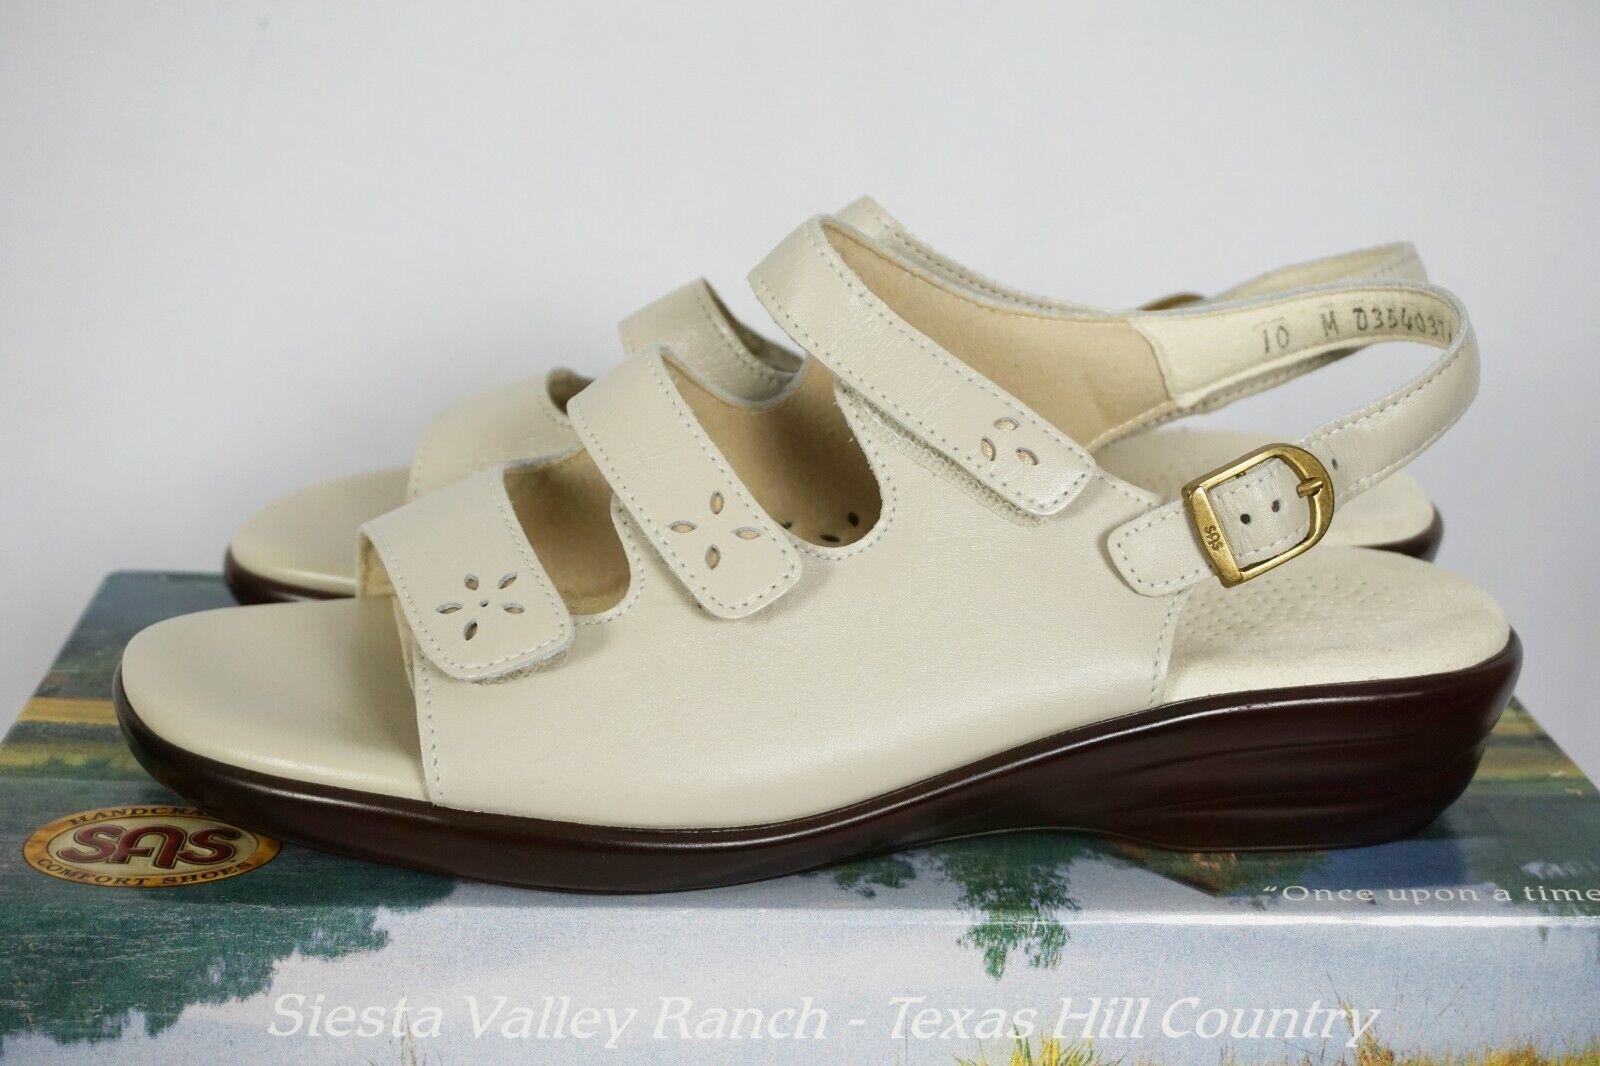 SAS Quatro Bone 3 Strap Comfort Sandals Womens Sz 10 M - NIB